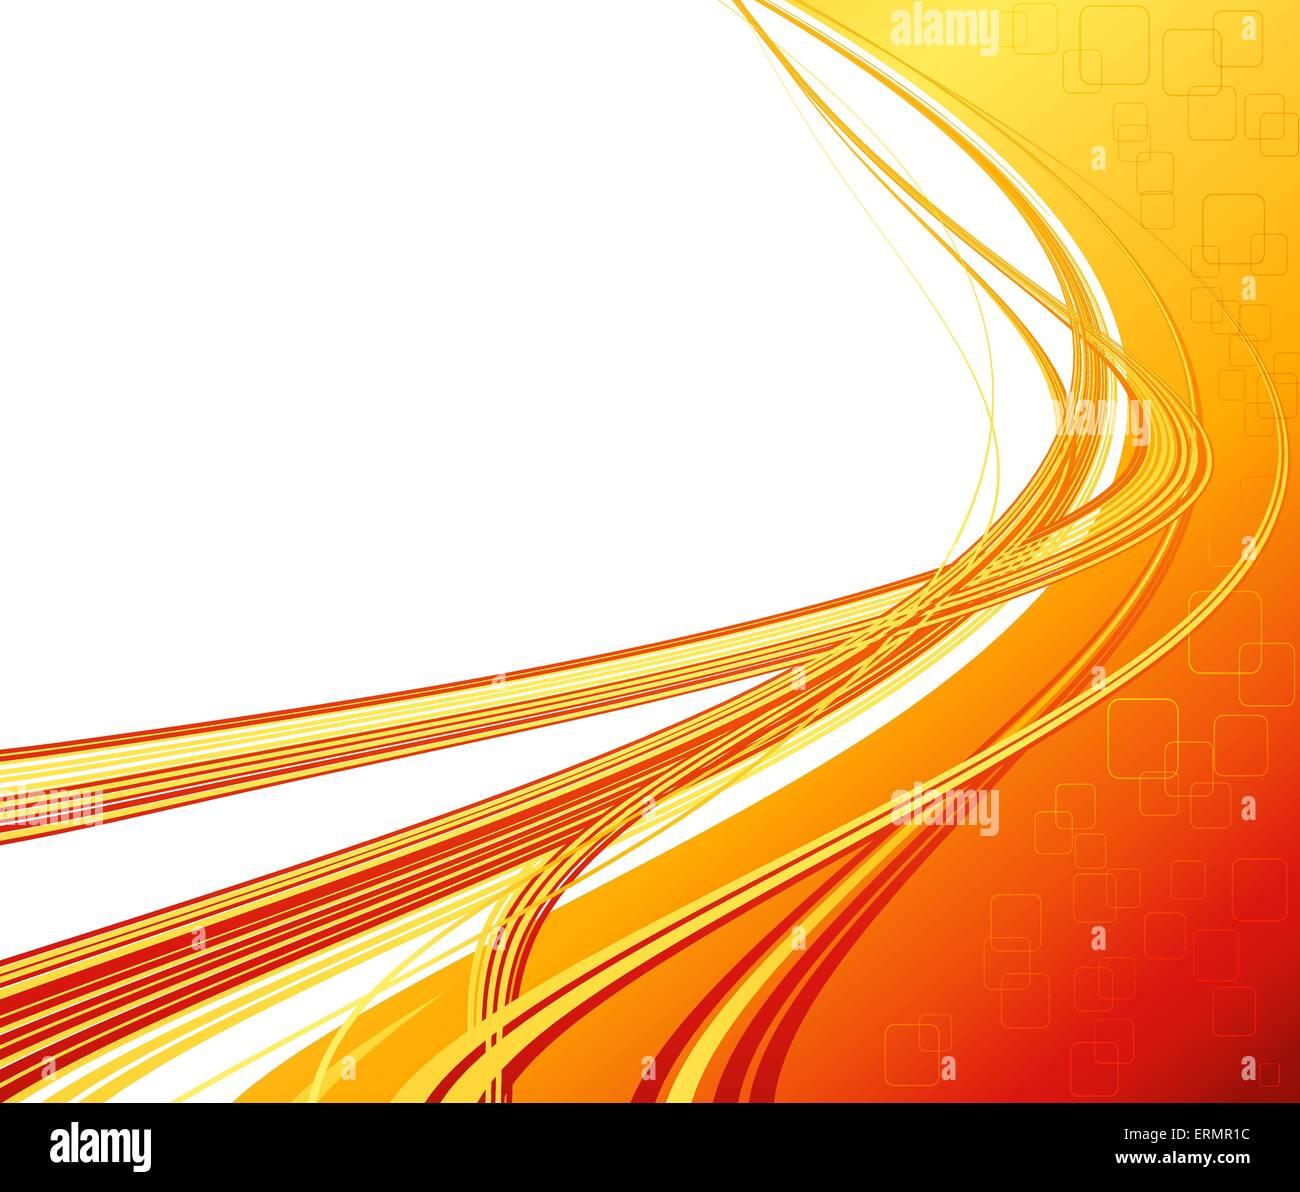 vector abstract orange color curved lines background technology stock vector art illustration. Black Bedroom Furniture Sets. Home Design Ideas